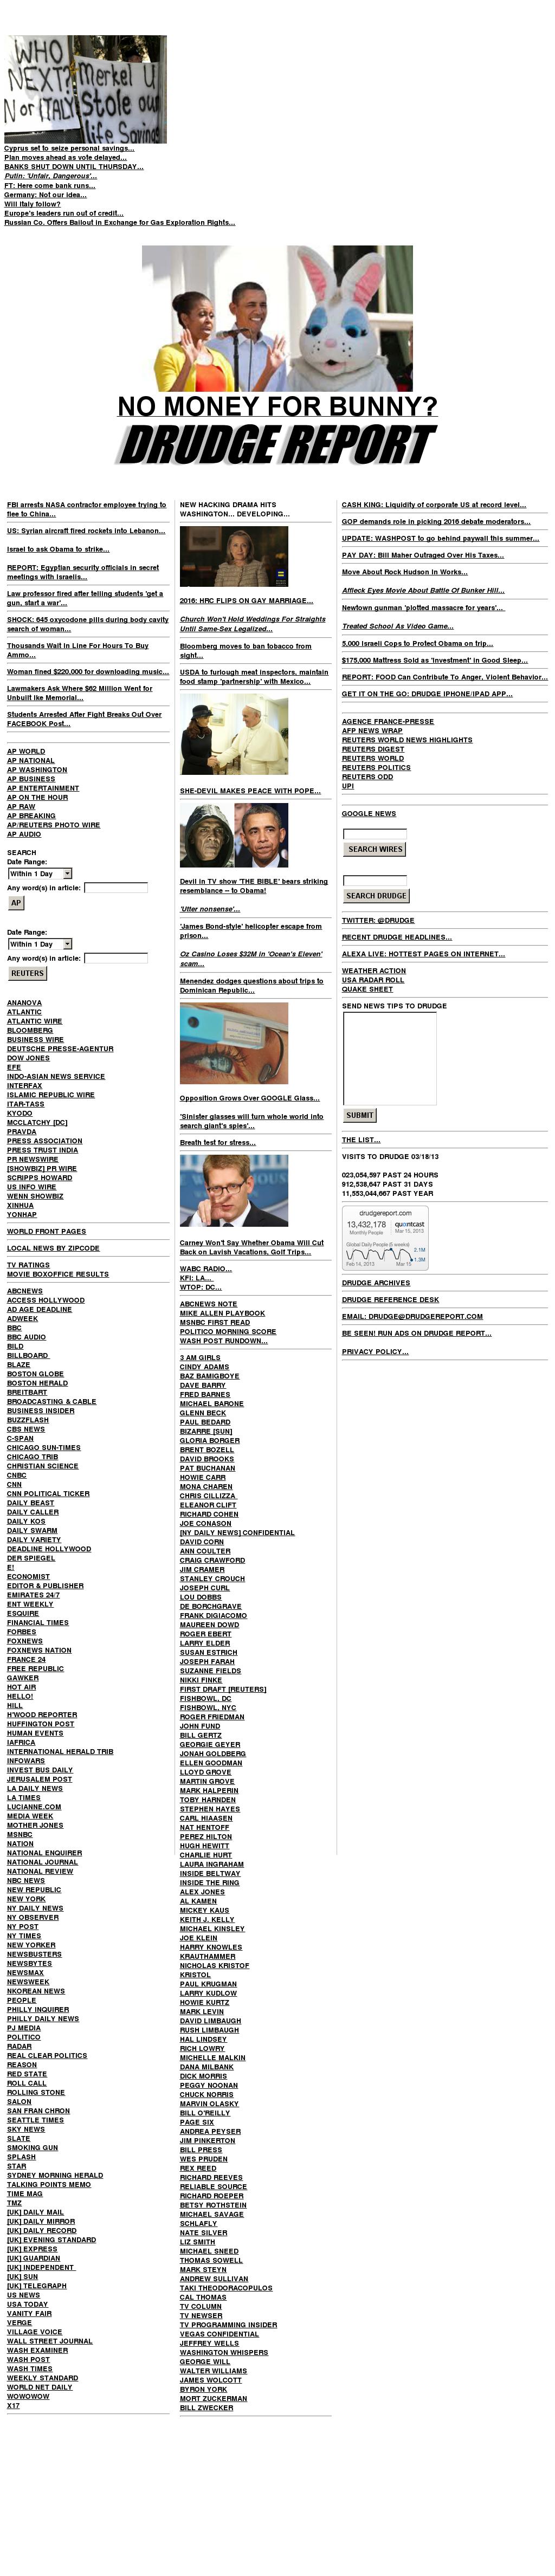 Drudge Report at Monday March 18, 2013, 11:05 p.m. UTC